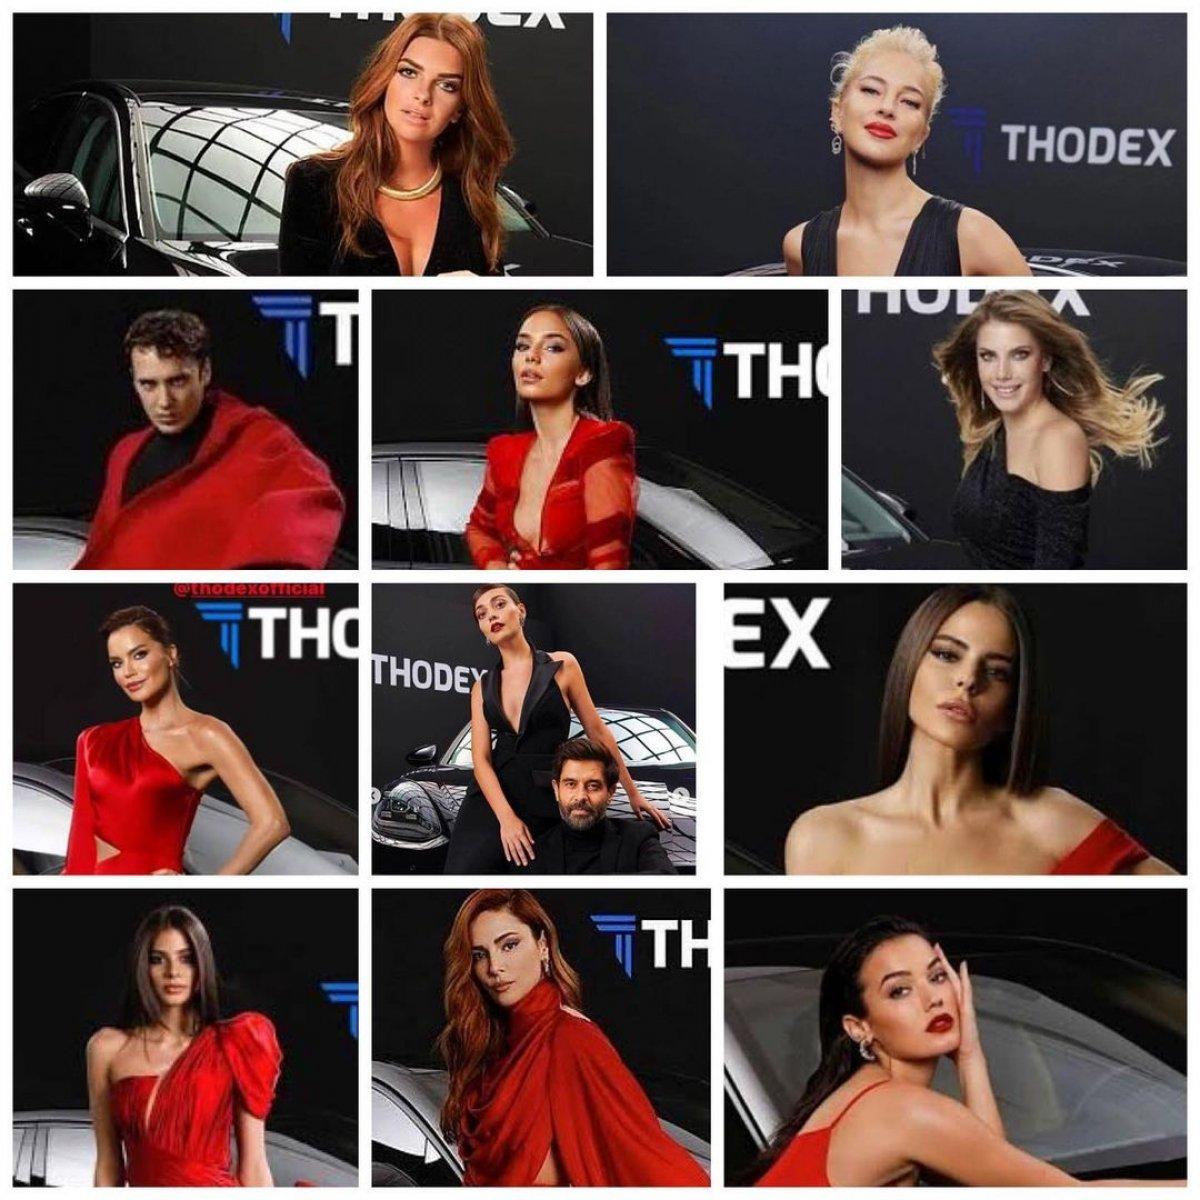 Thodex reklamında oynayan ünlülere suç duyurusu #2